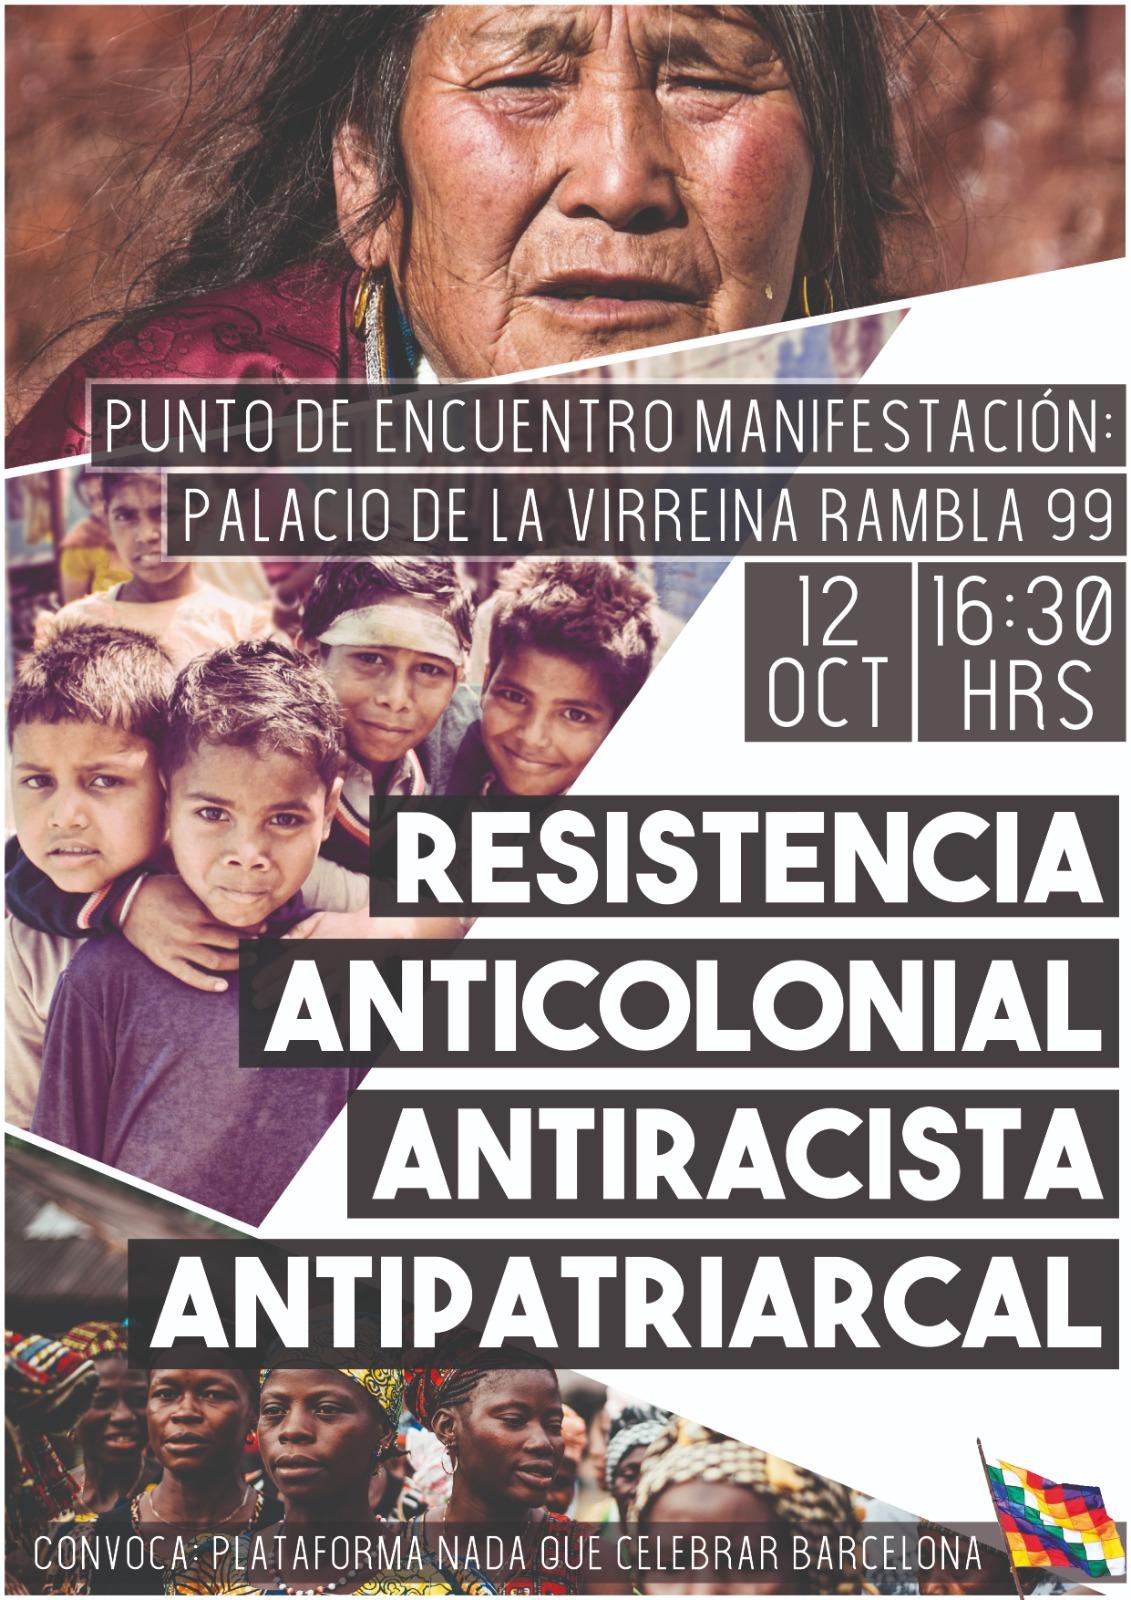 Barcelona: Mani. Oct 12 16.30.  Nada Que Celebrar ..Nothing tocelebrate!